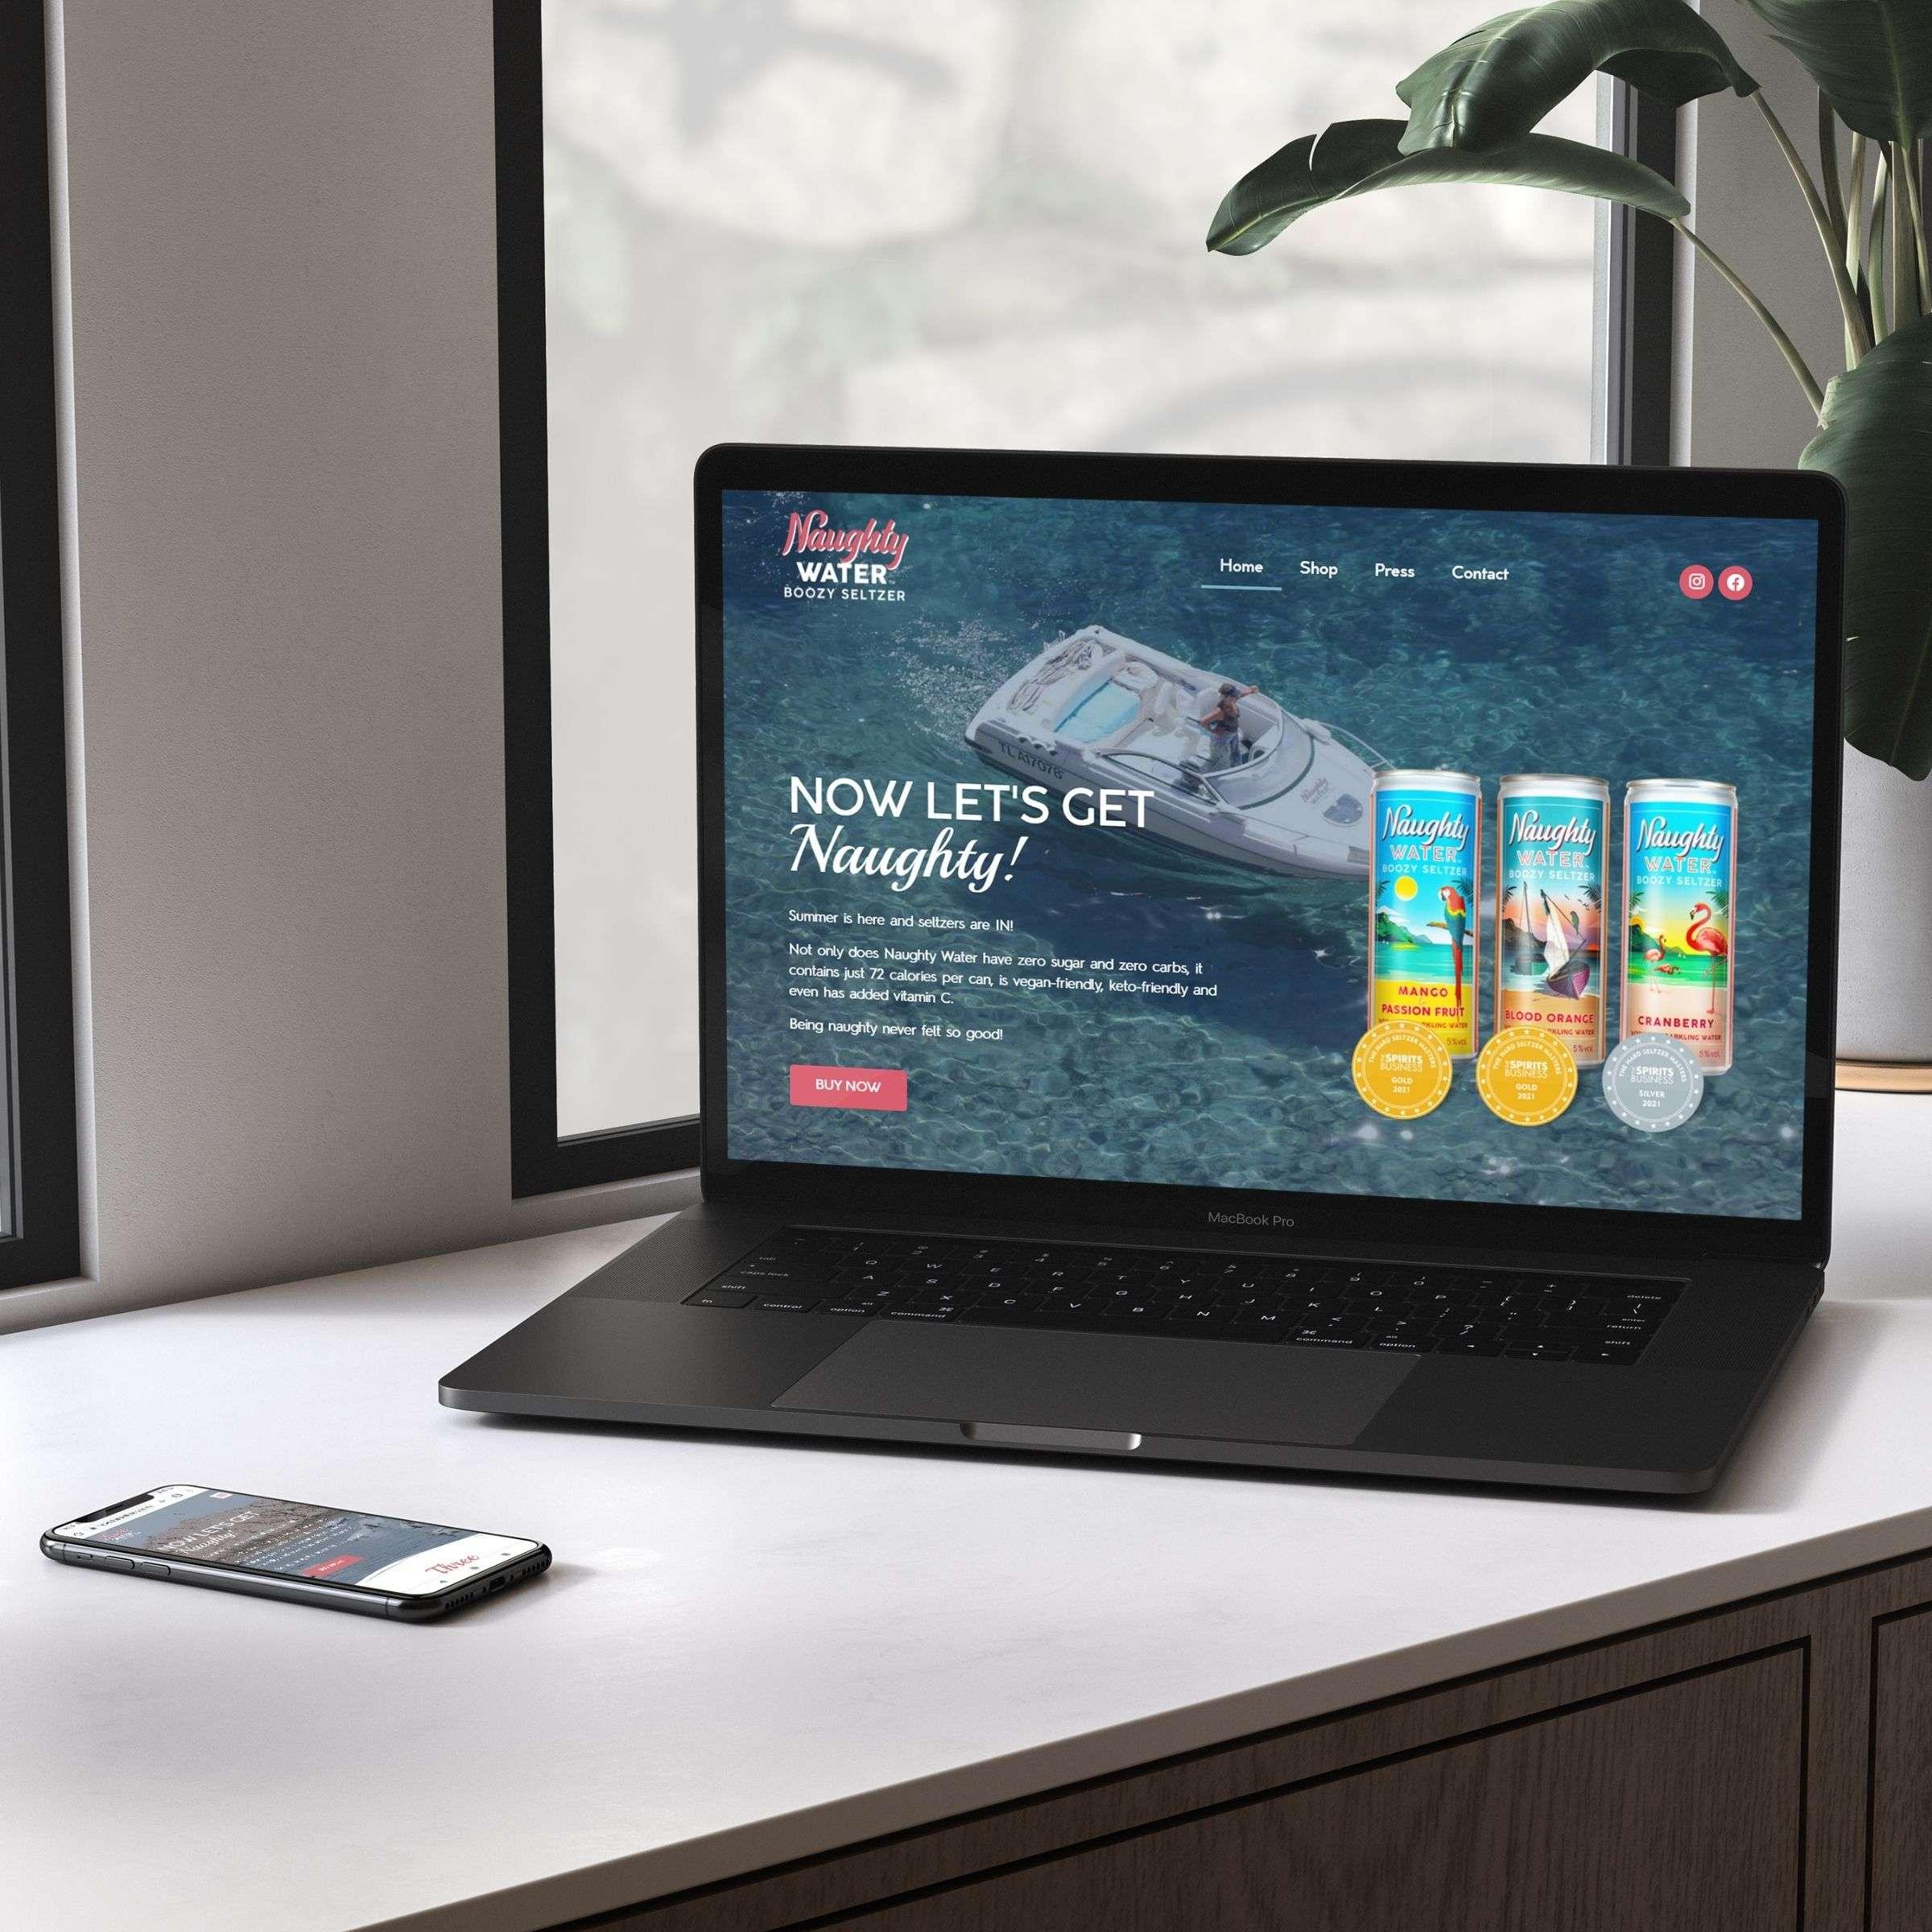 Naughty Water Website